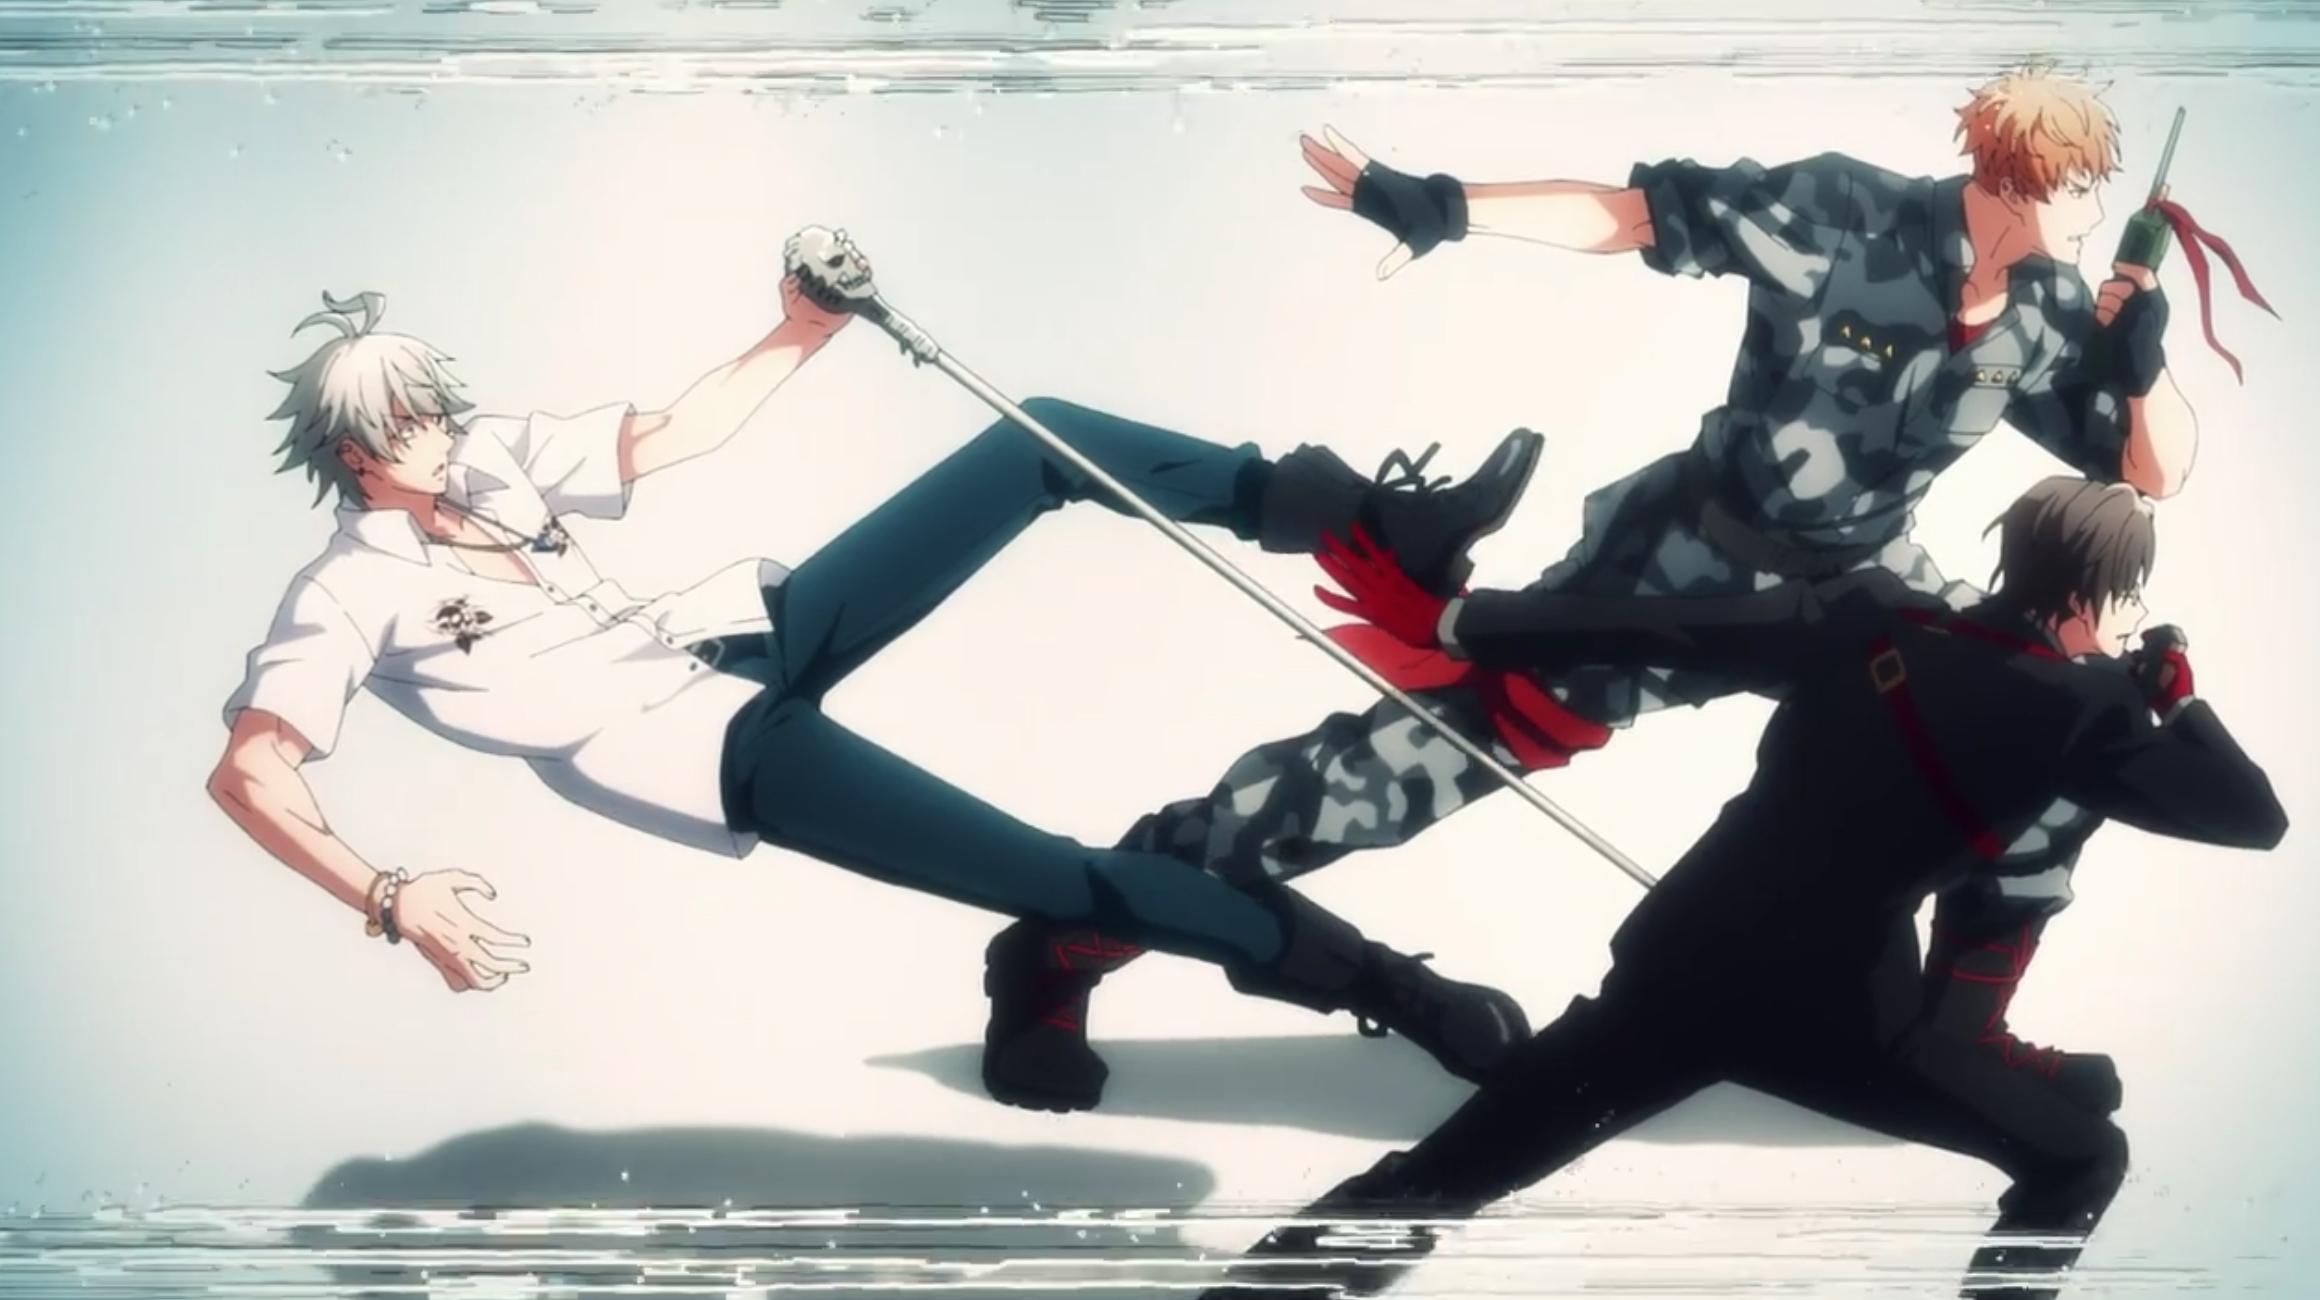 TVアニメ「ヒプマイ」11話感想 マットリvs麻天狼の決勝がついにスタート!乱数は中王区から脱走する決意を決める